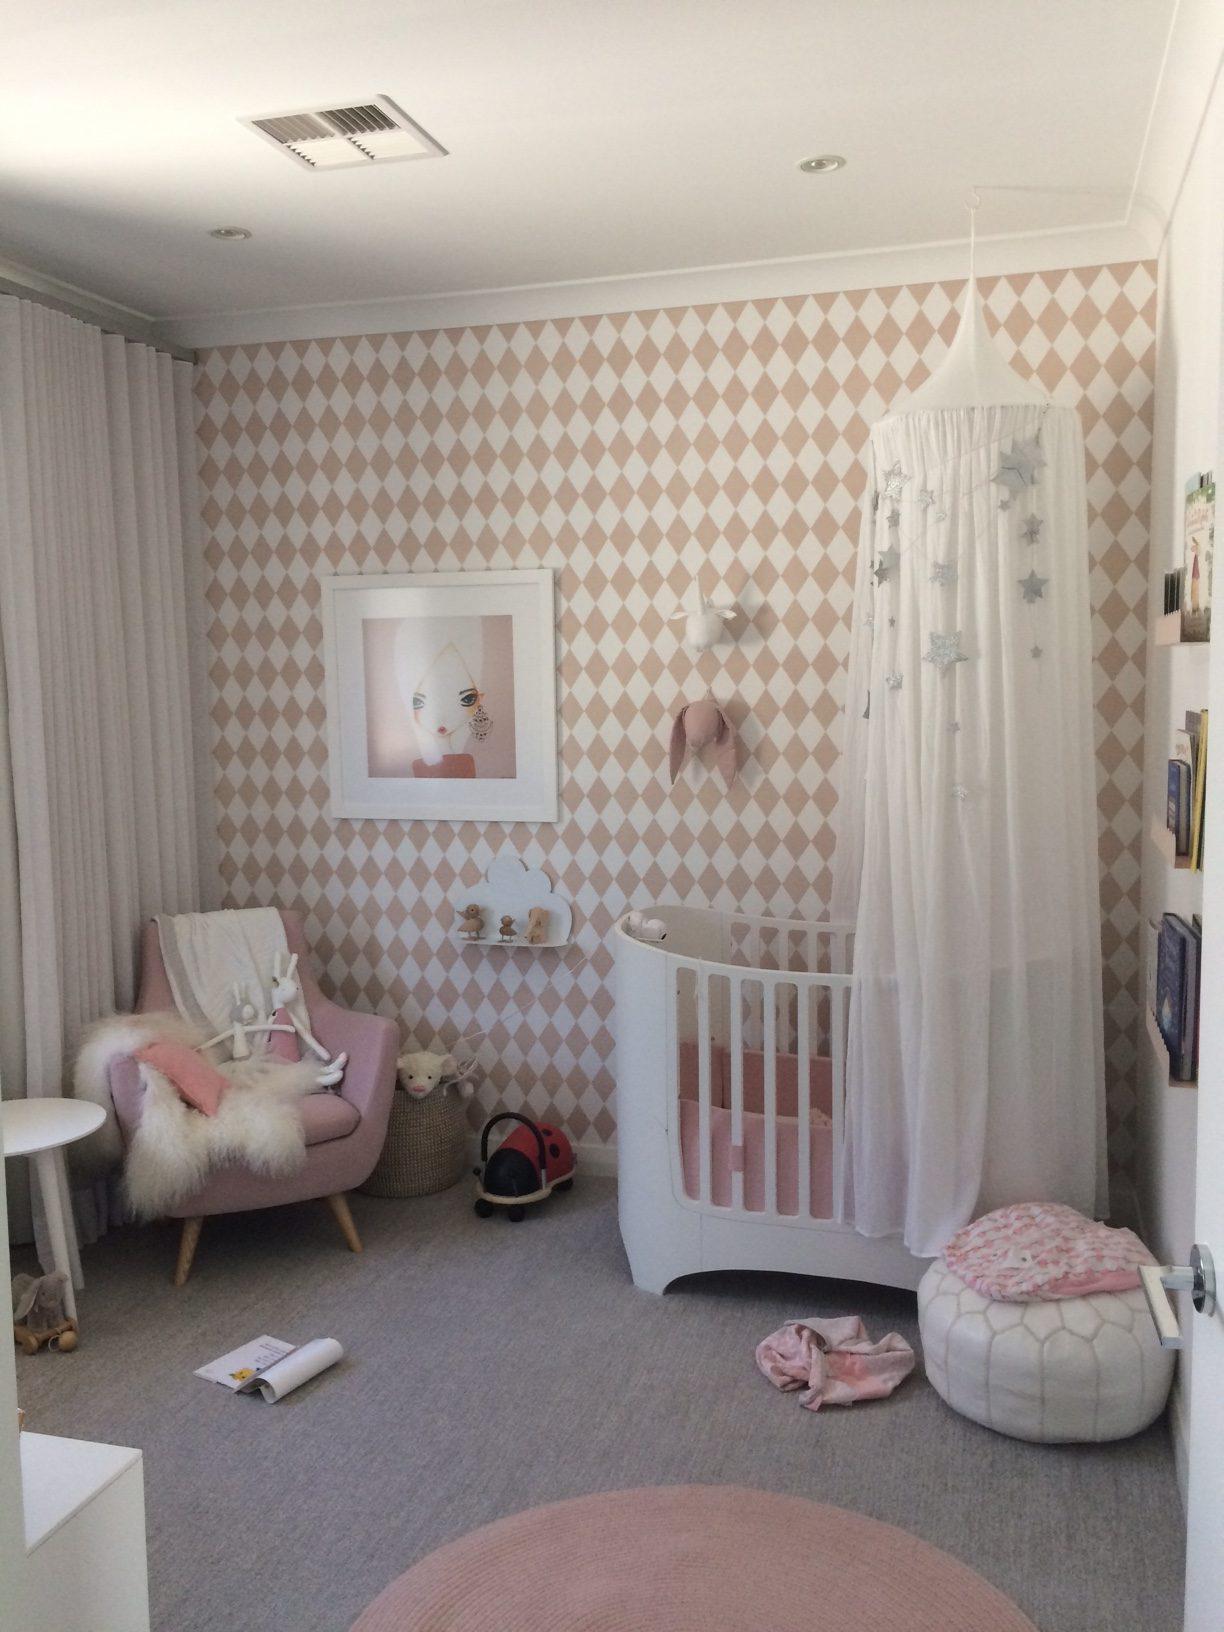 Miffy with Swedish Wallpaper